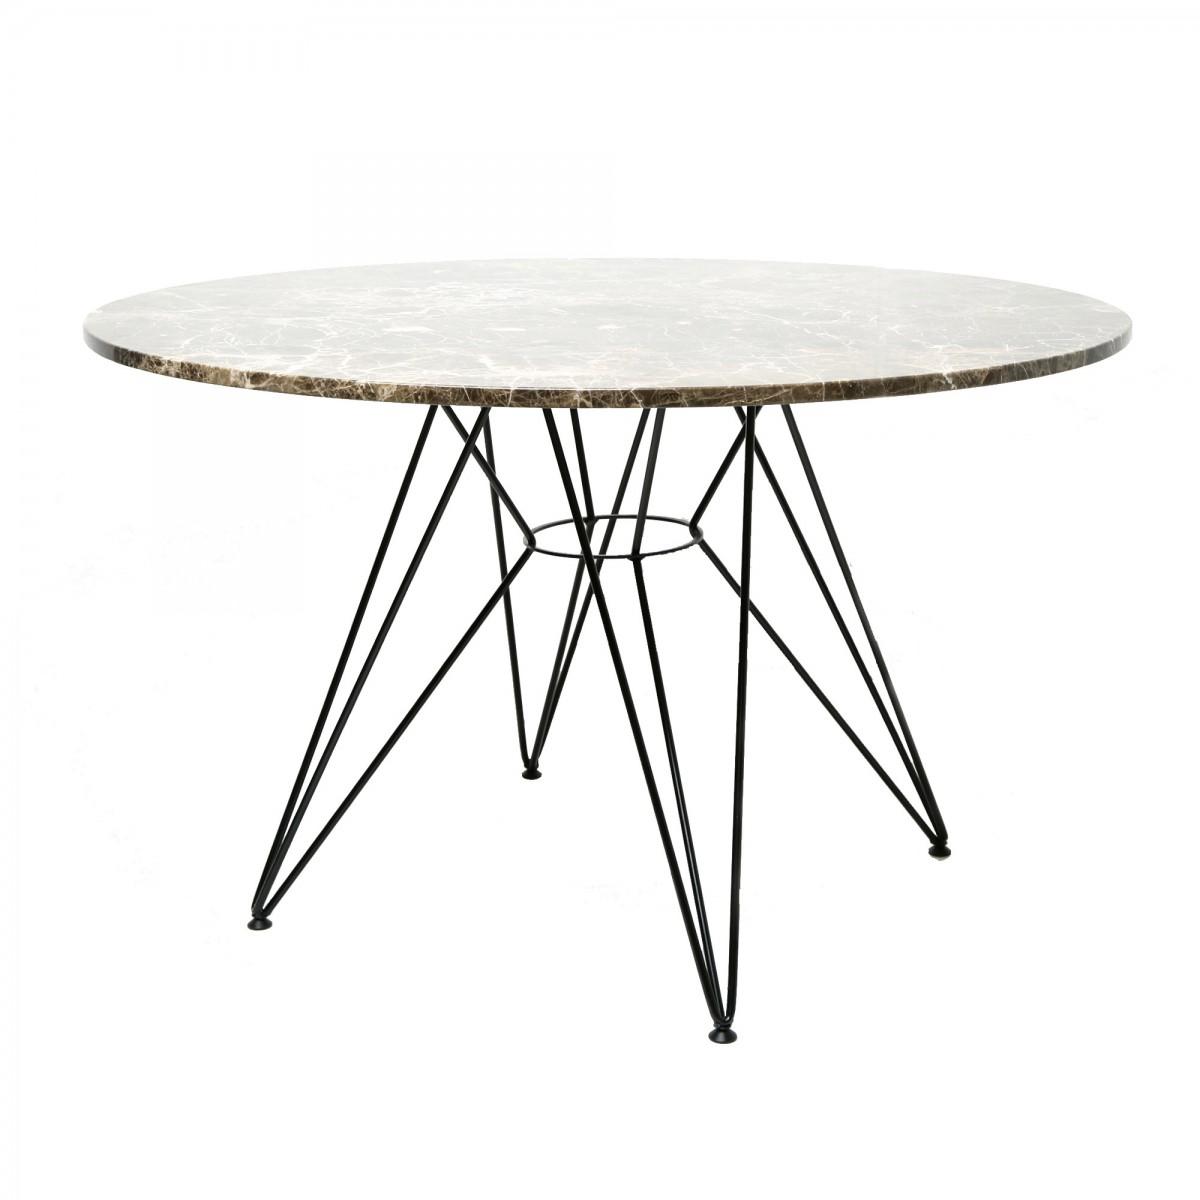 Table Salle à Manger Marbre: Table Basse ANTI-C Marbre Empereur- LOBSTER'S DAY